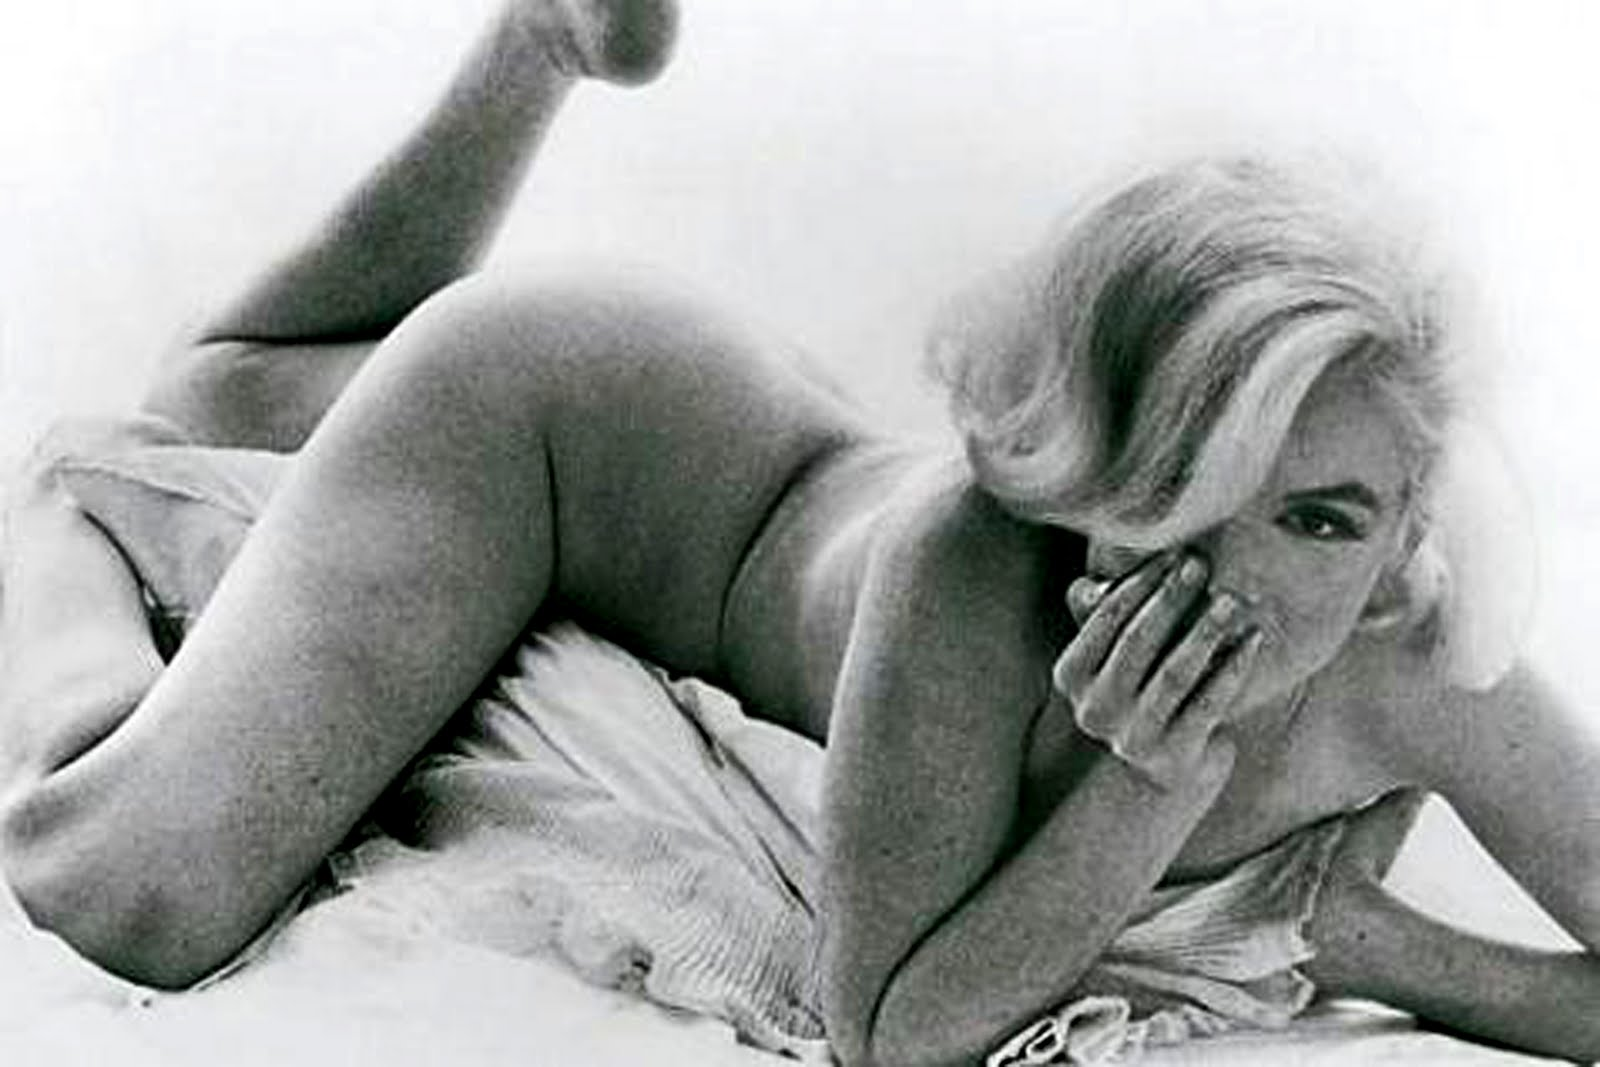 http://4.bp.blogspot.com/-wOc0VJZ5sBY/TeMRSQjLlOI/AAAAAAAAAw8/RevCBAg6en0/s1600/129_2843-marilyn-monroe-bert-stern.jpg